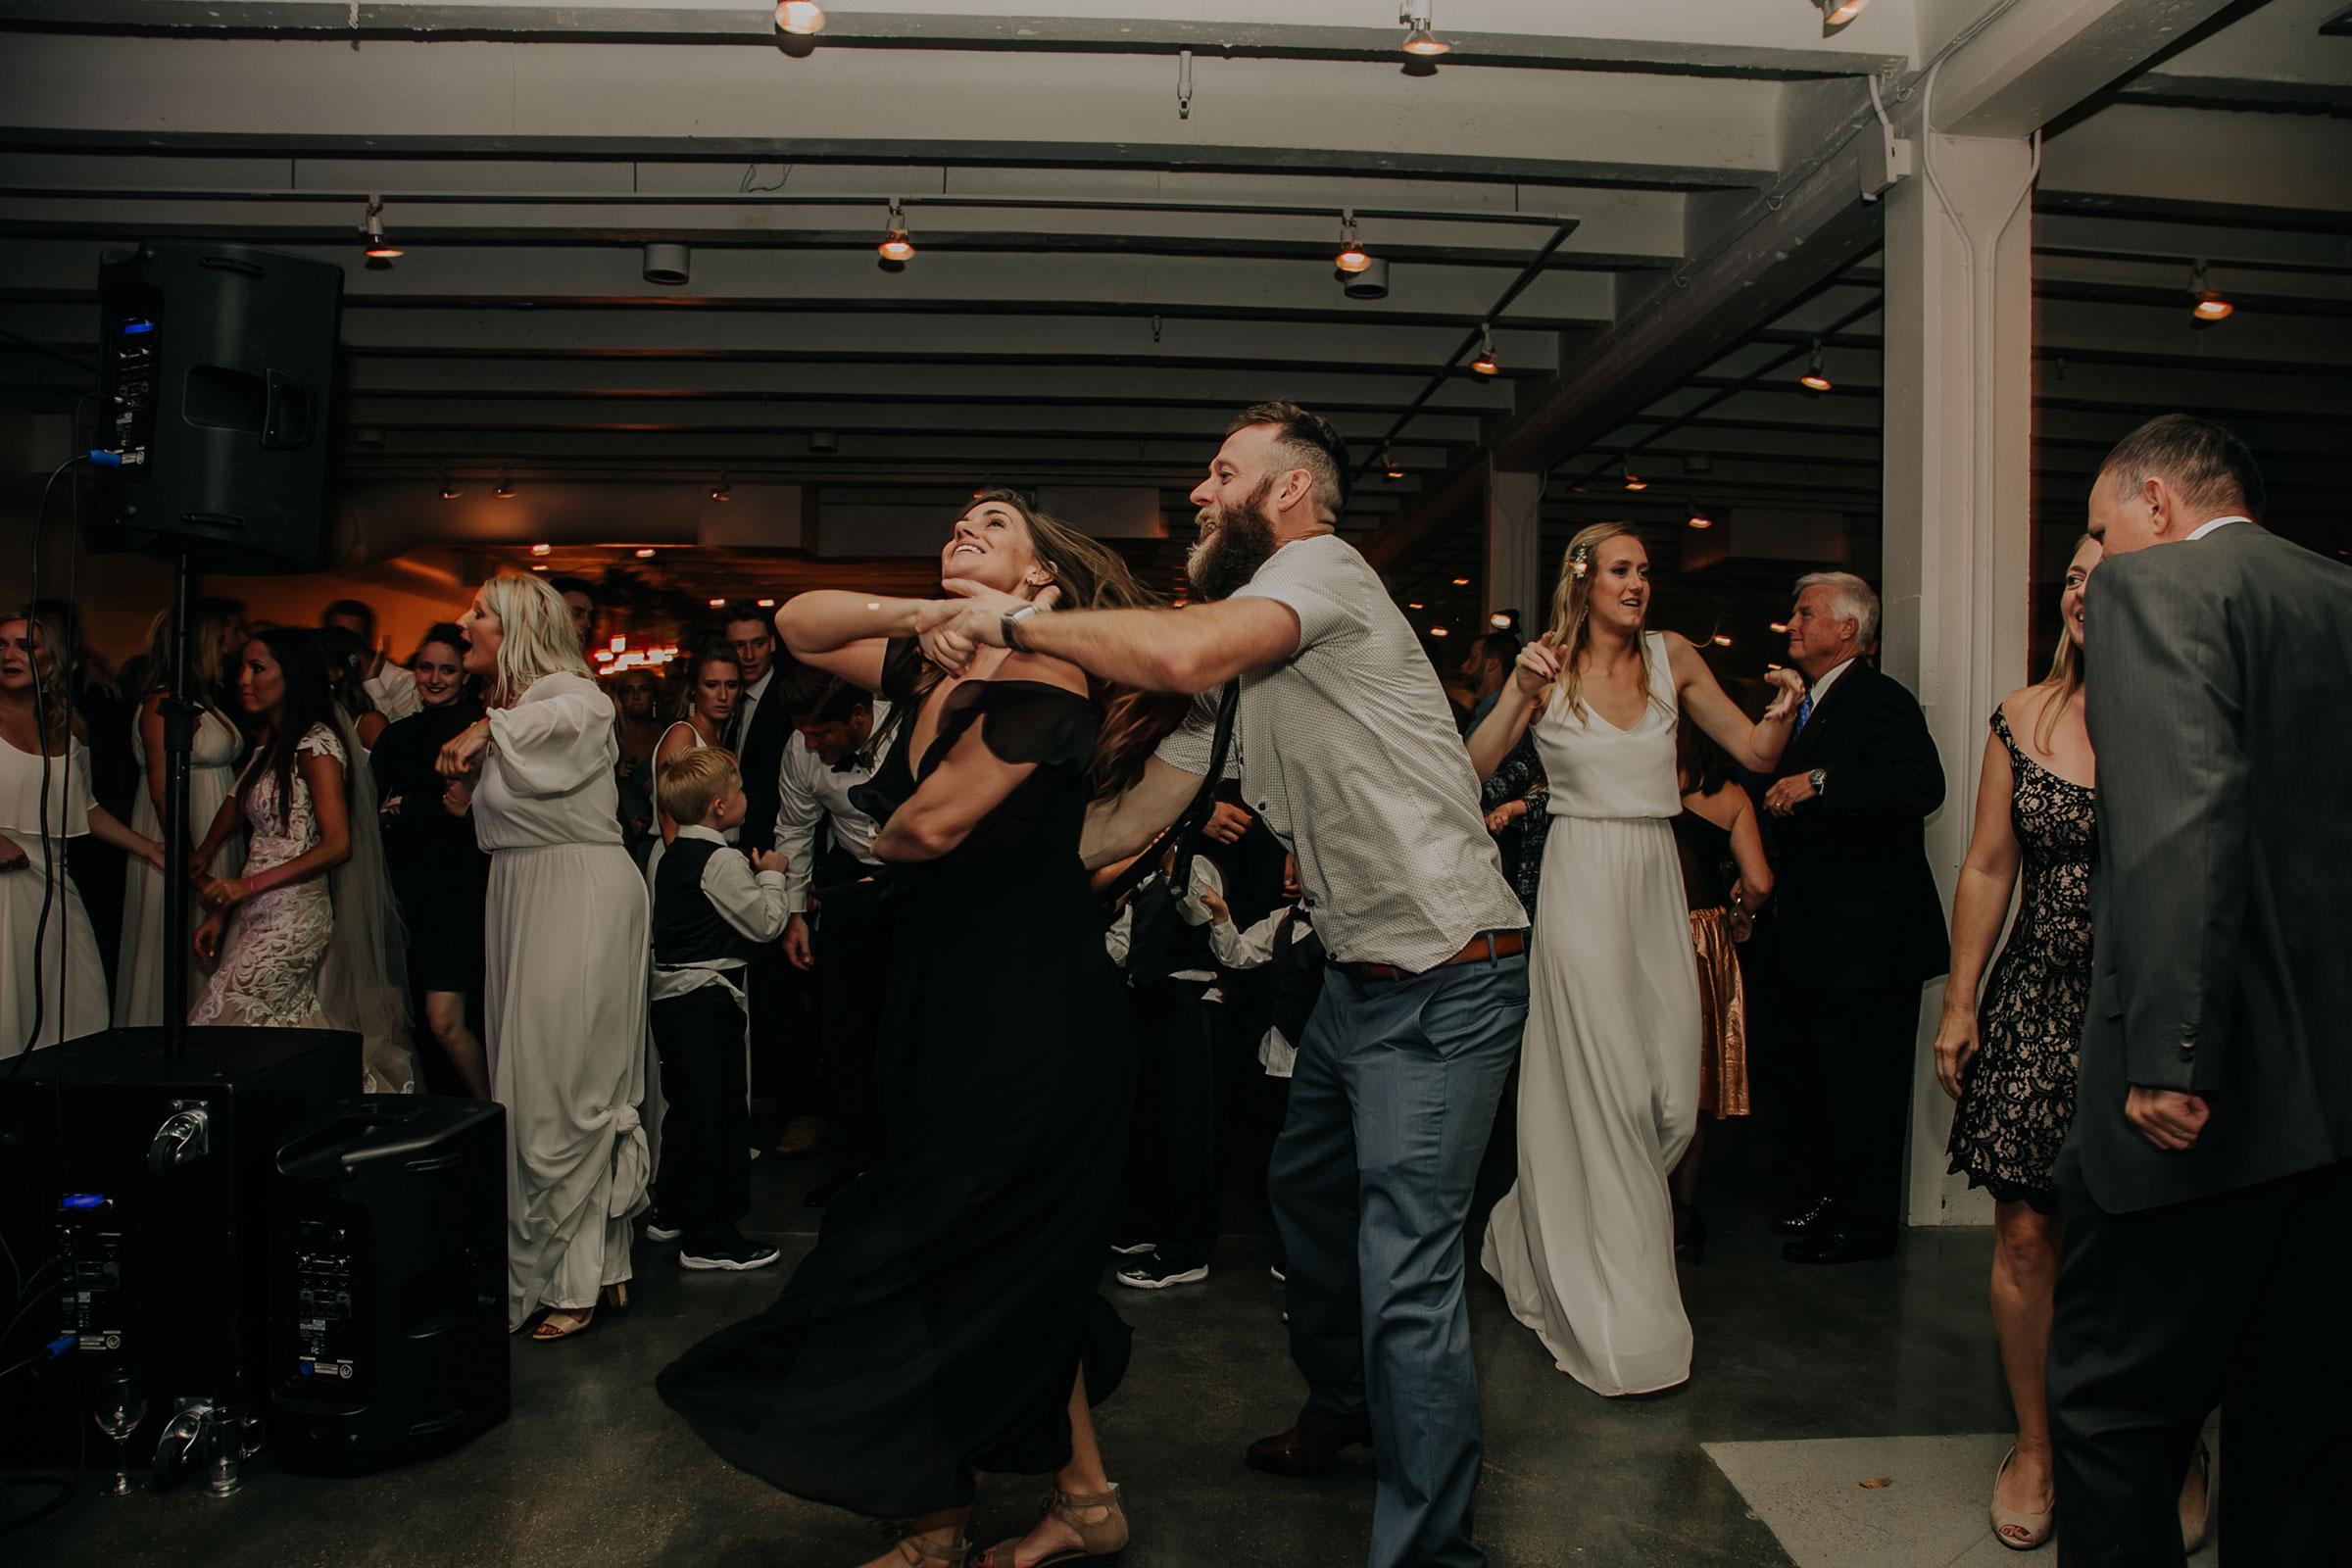 reception-guests-dancing-founders-one-nine-omaha-nebraska-raelyn-ramey-photography.jpg